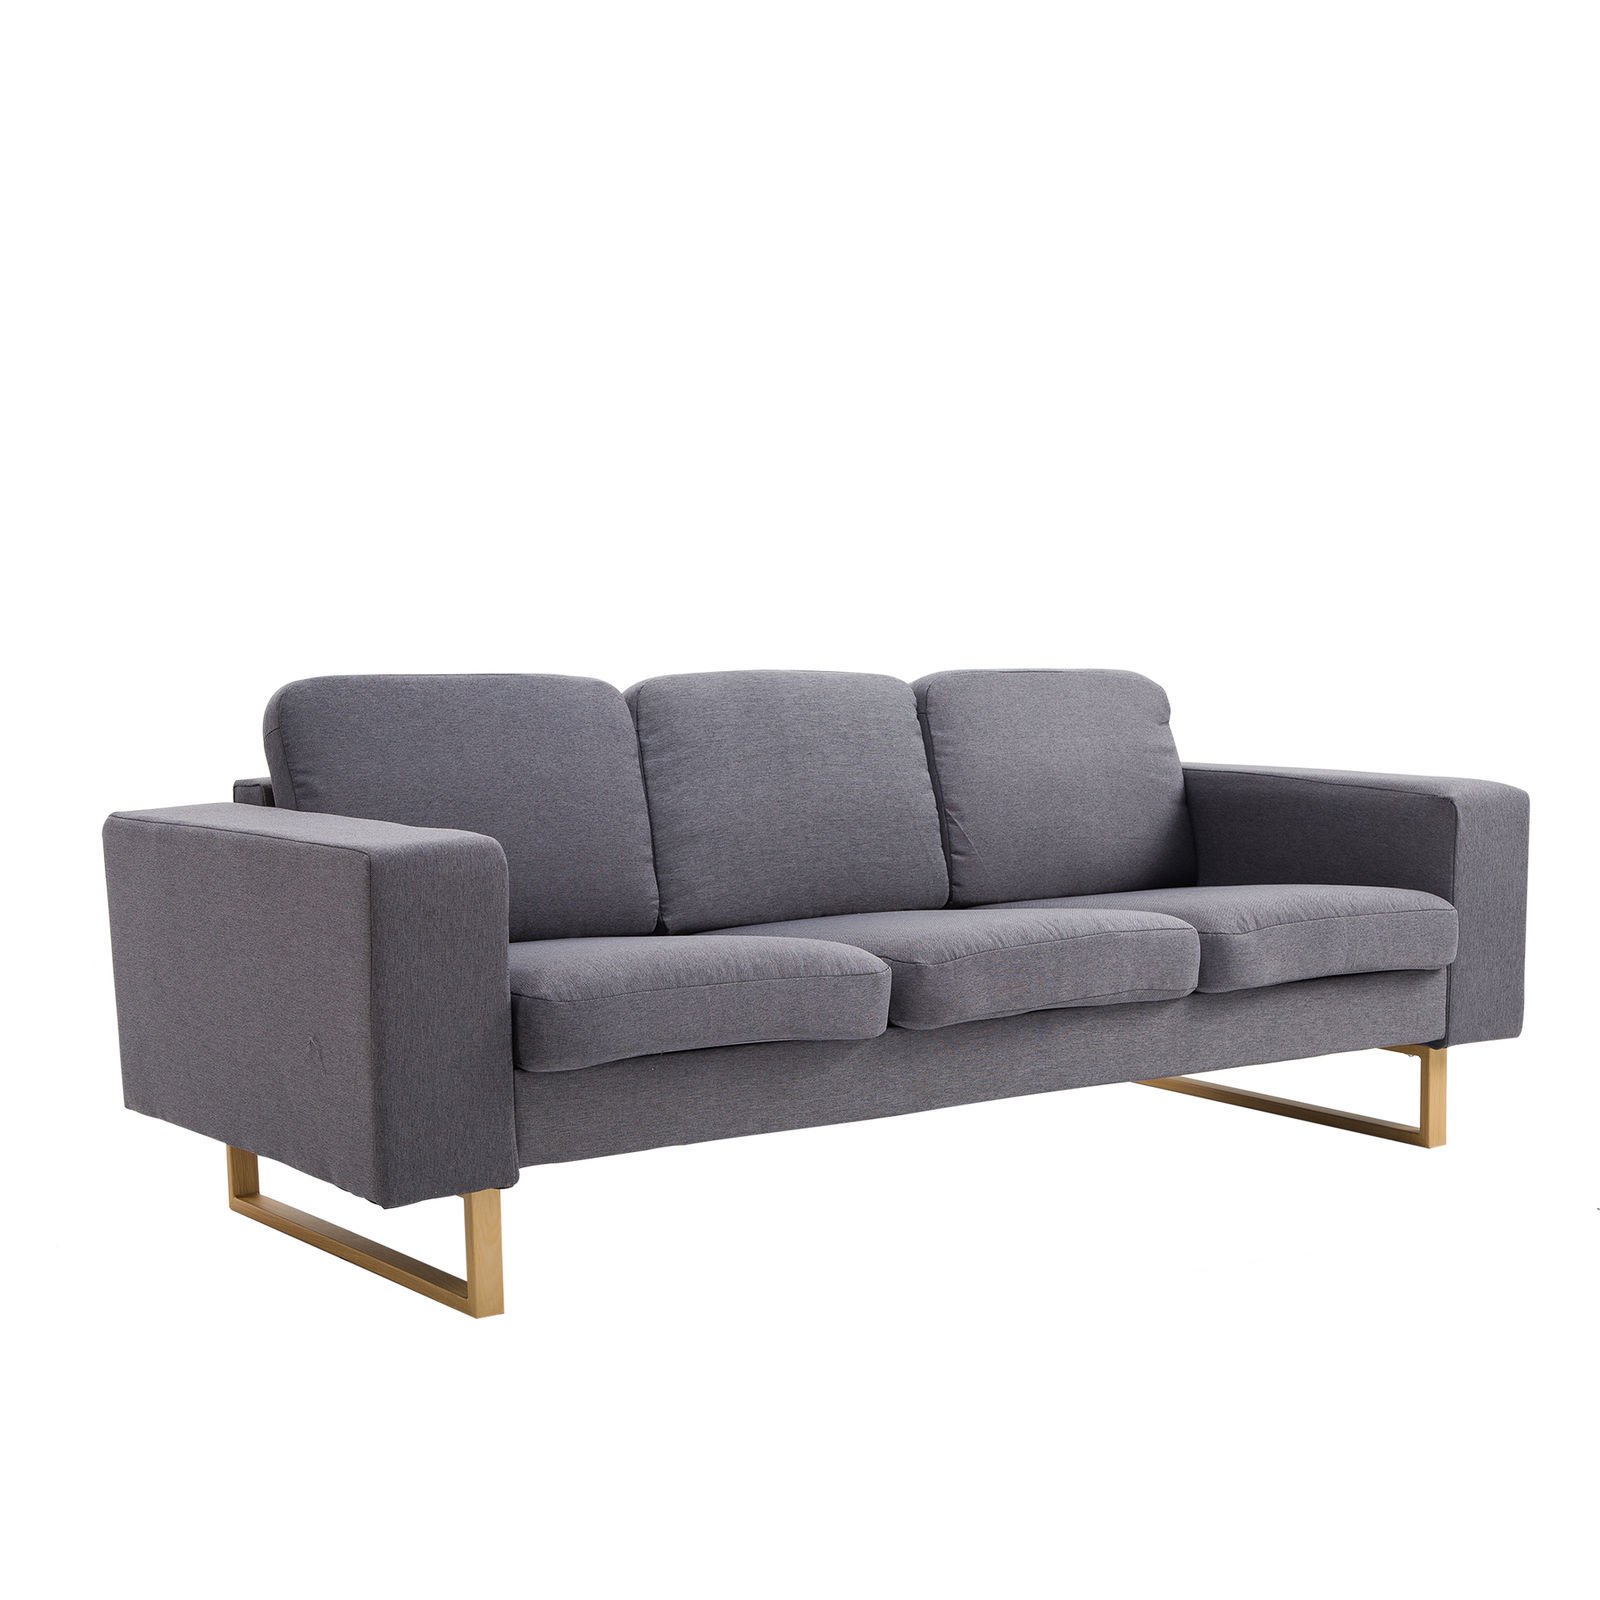 Mid century modern sofa 3 seater loveseat padded linen dark grey roll